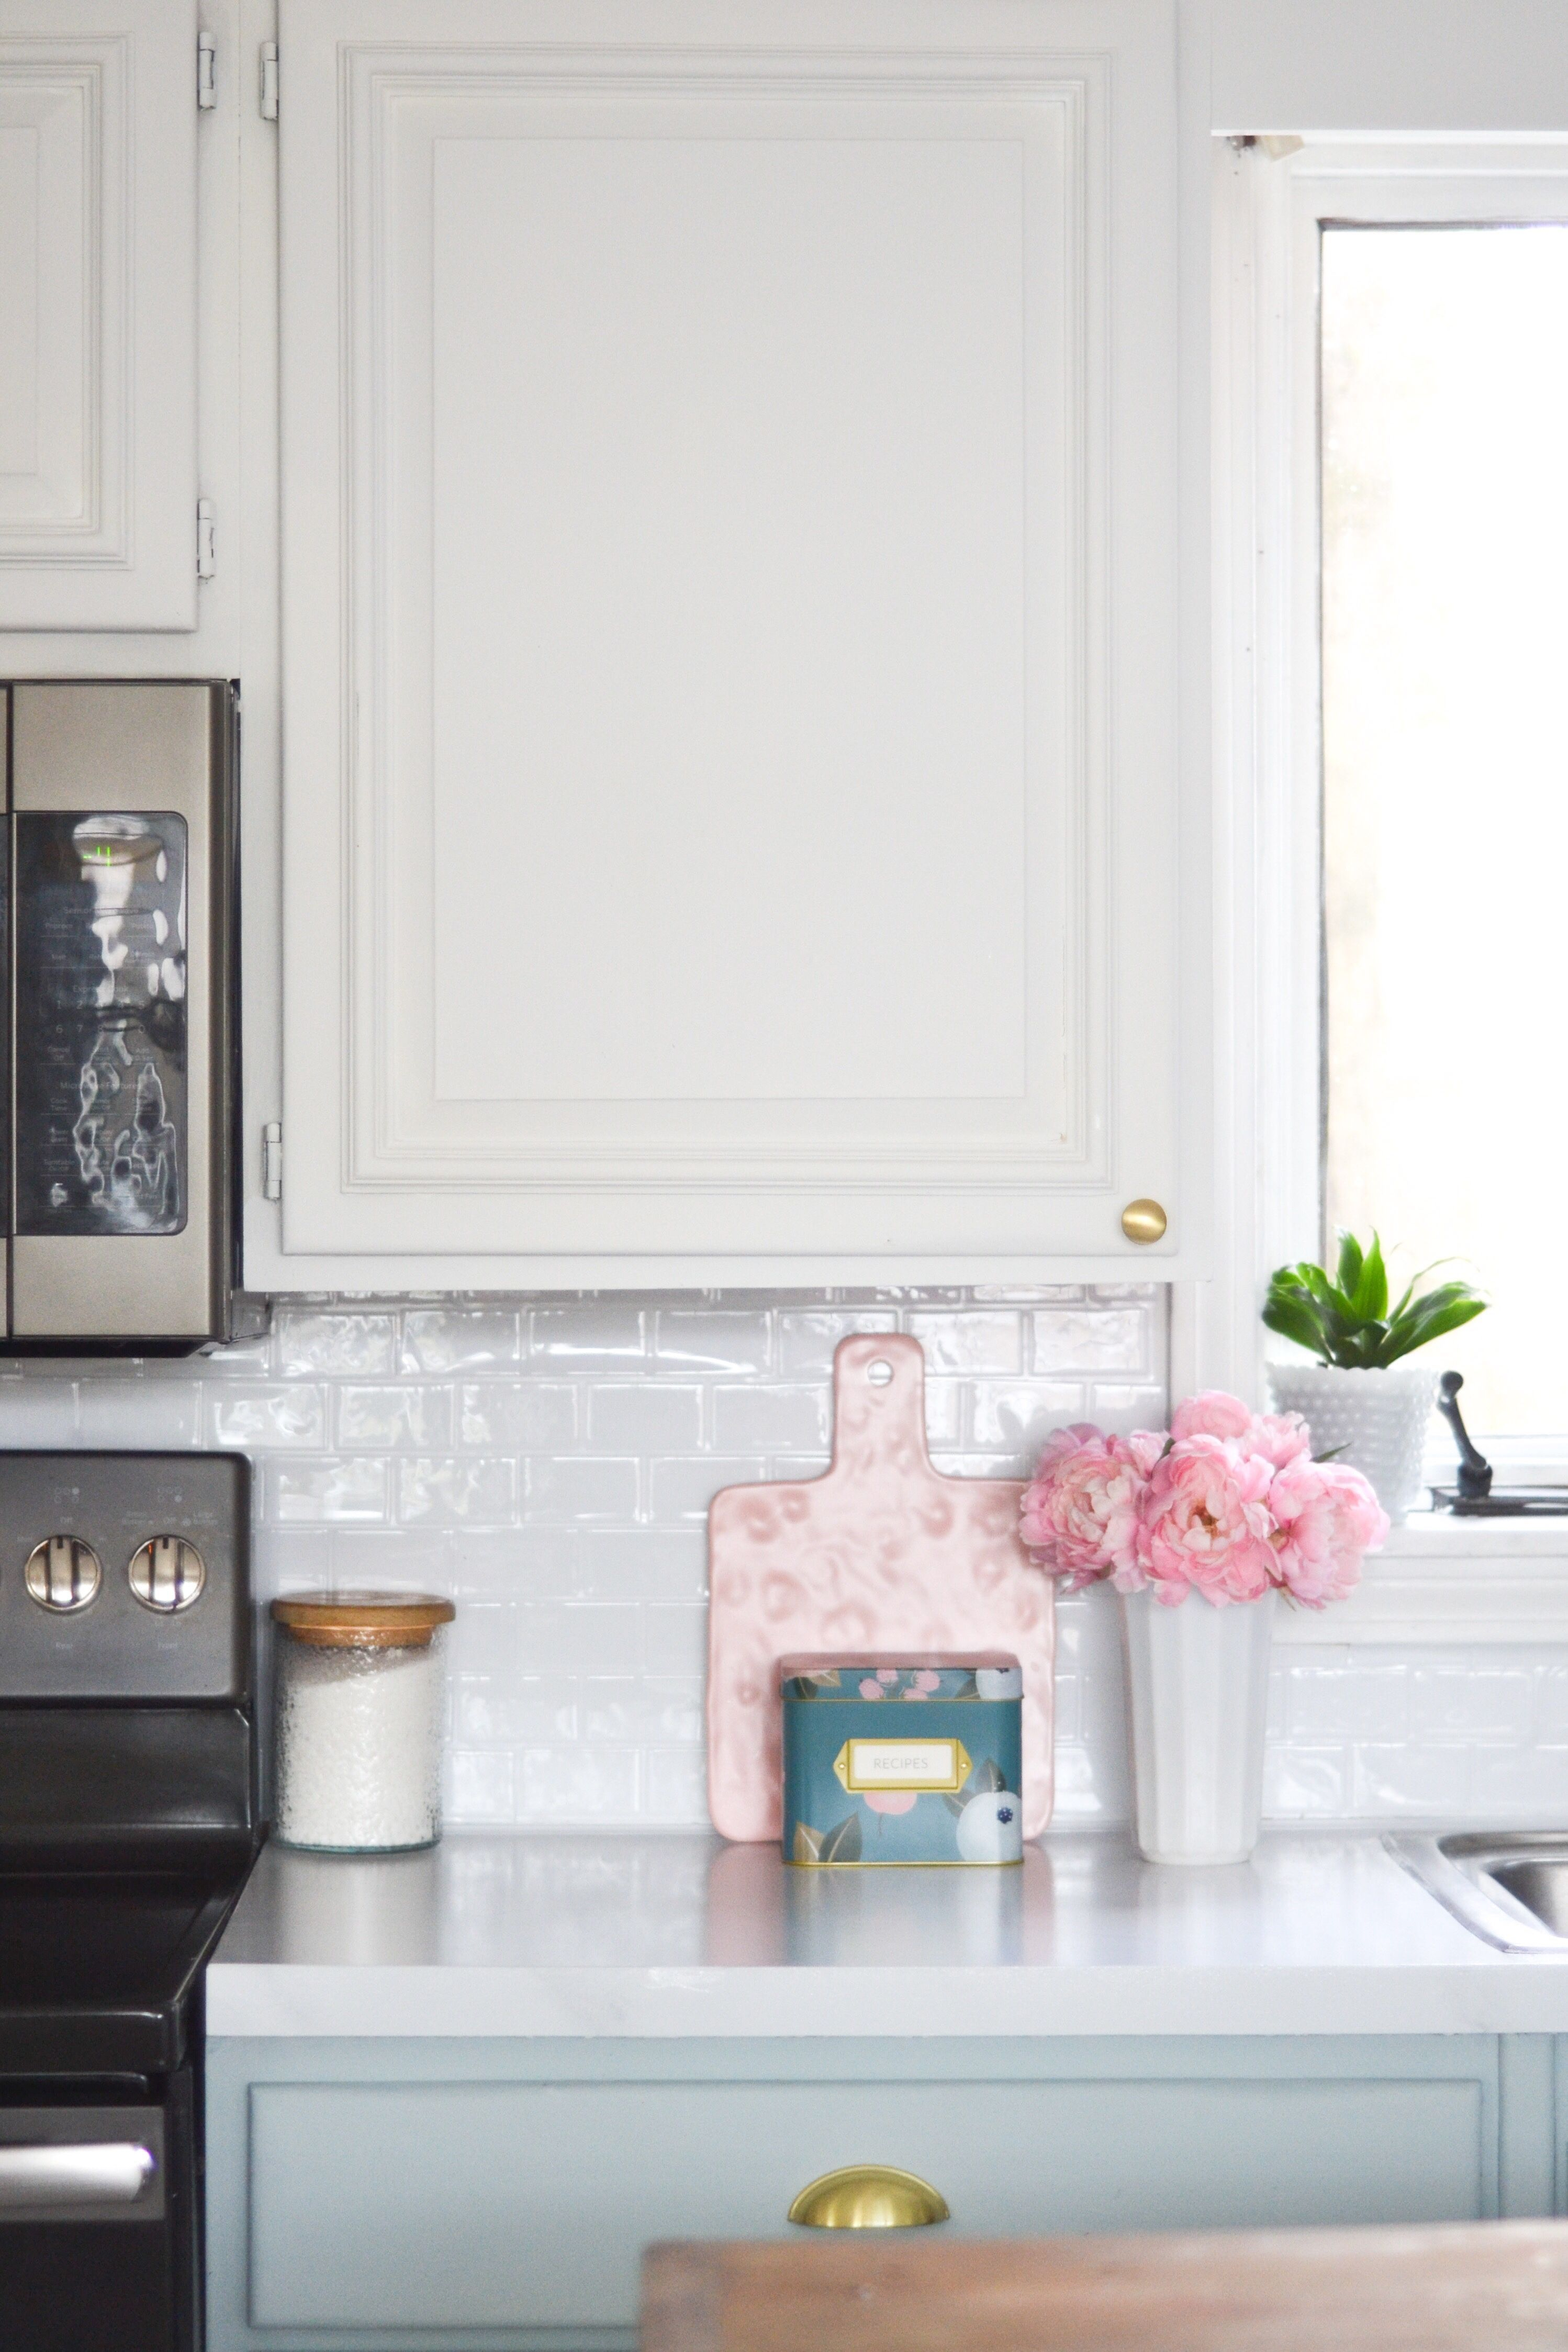 Diy marble painted countertops